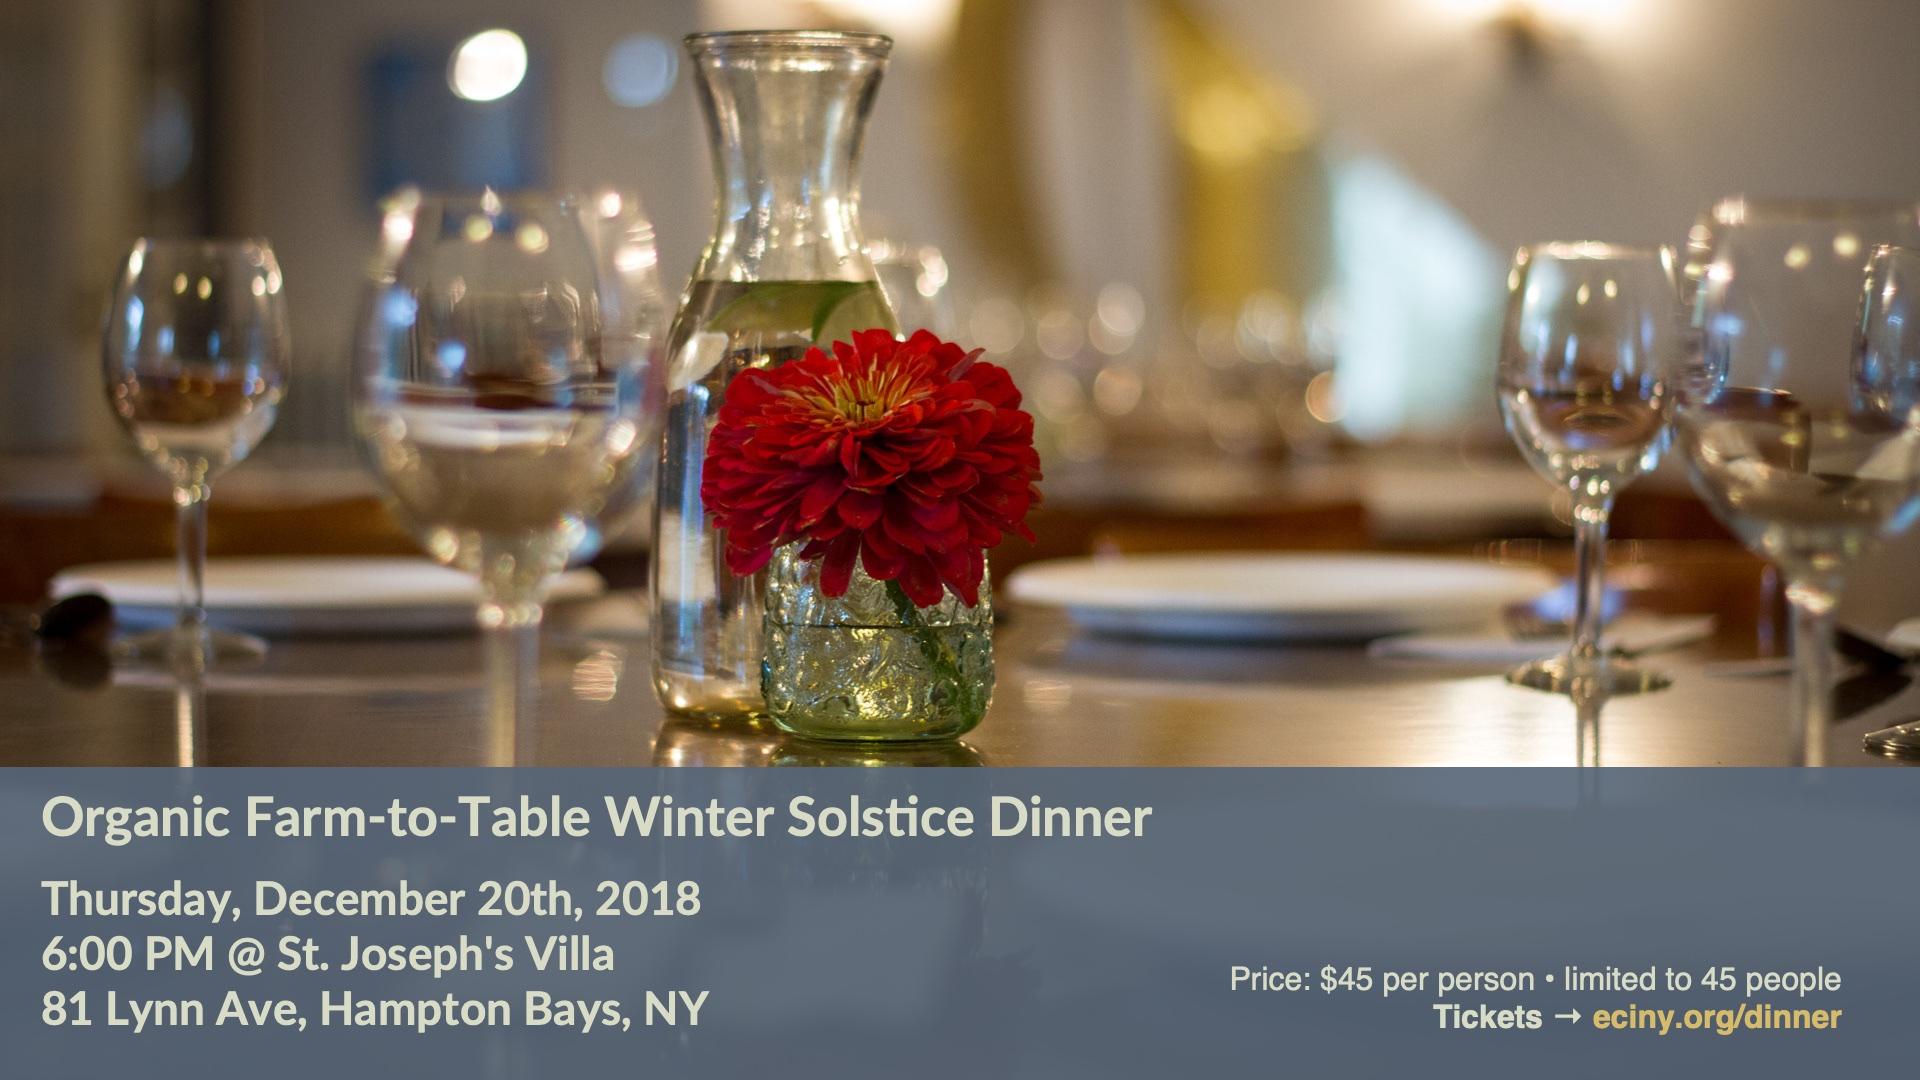 Organic Farm-to-Table Winter Solstice Dinner - Dec 20, 2018 - FB cover 1920x1080.jpg